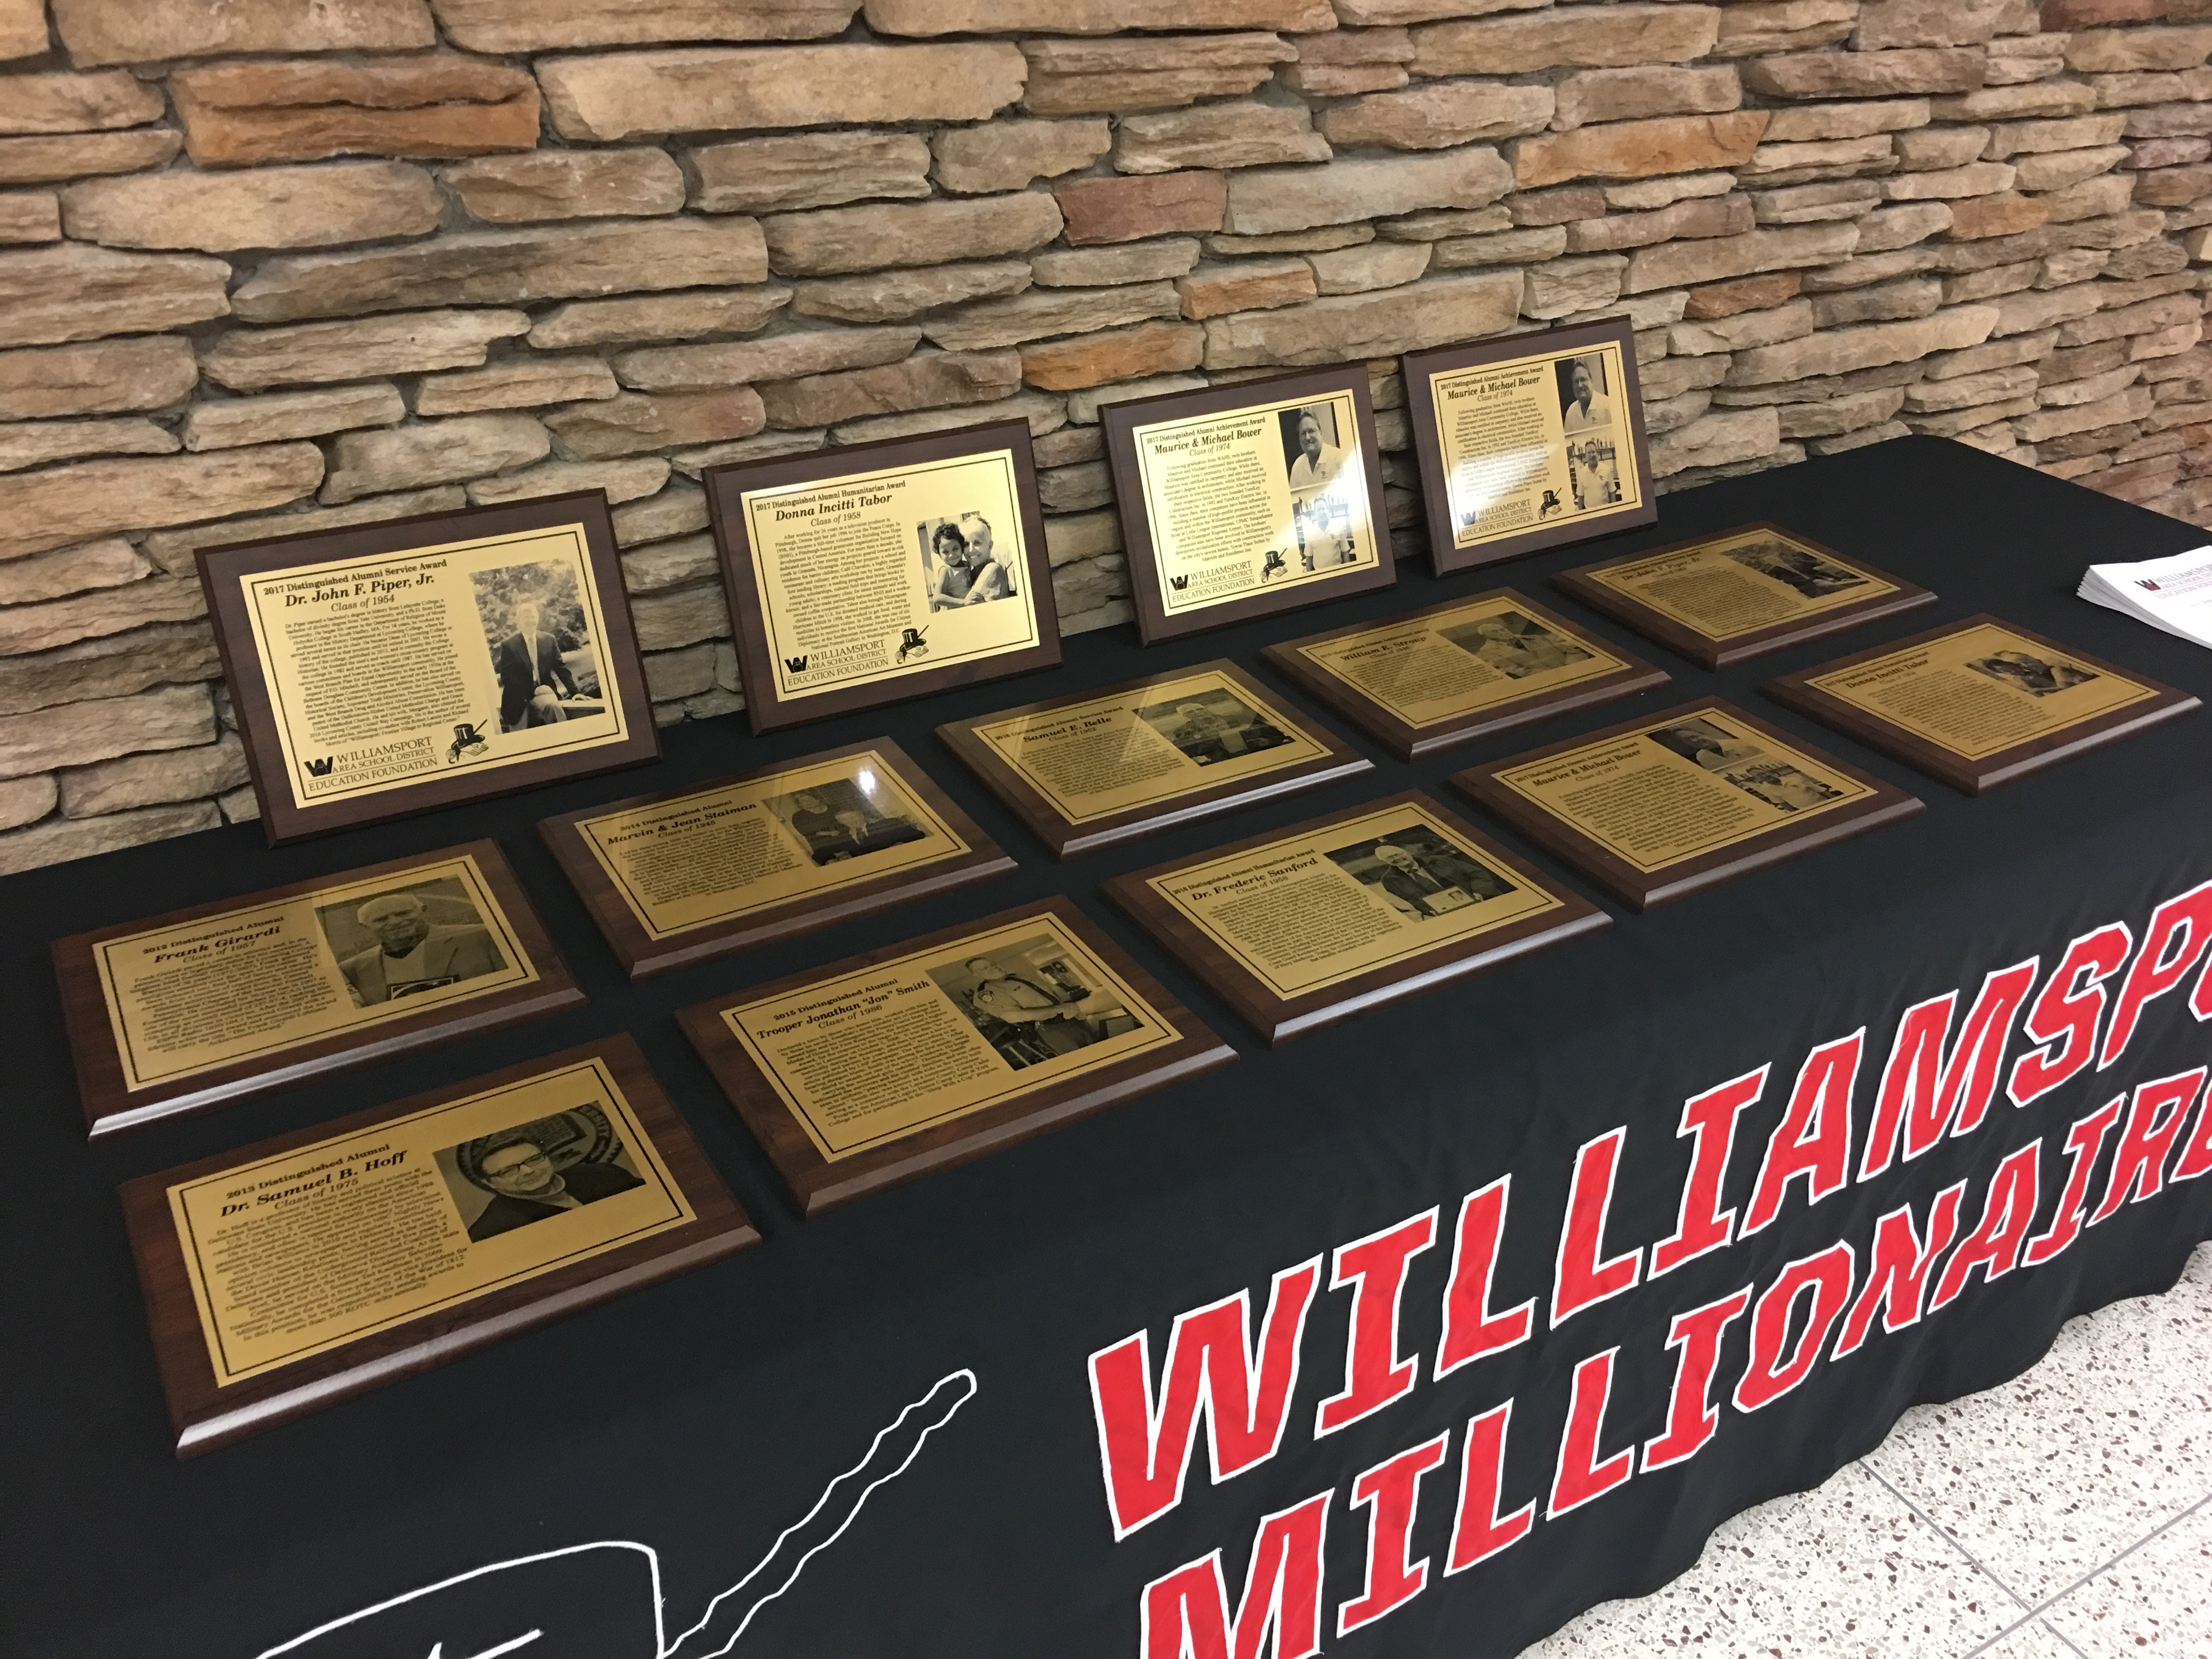 WASD Education Foundation Seeks Nominations for 2018 Distinguished Alumni